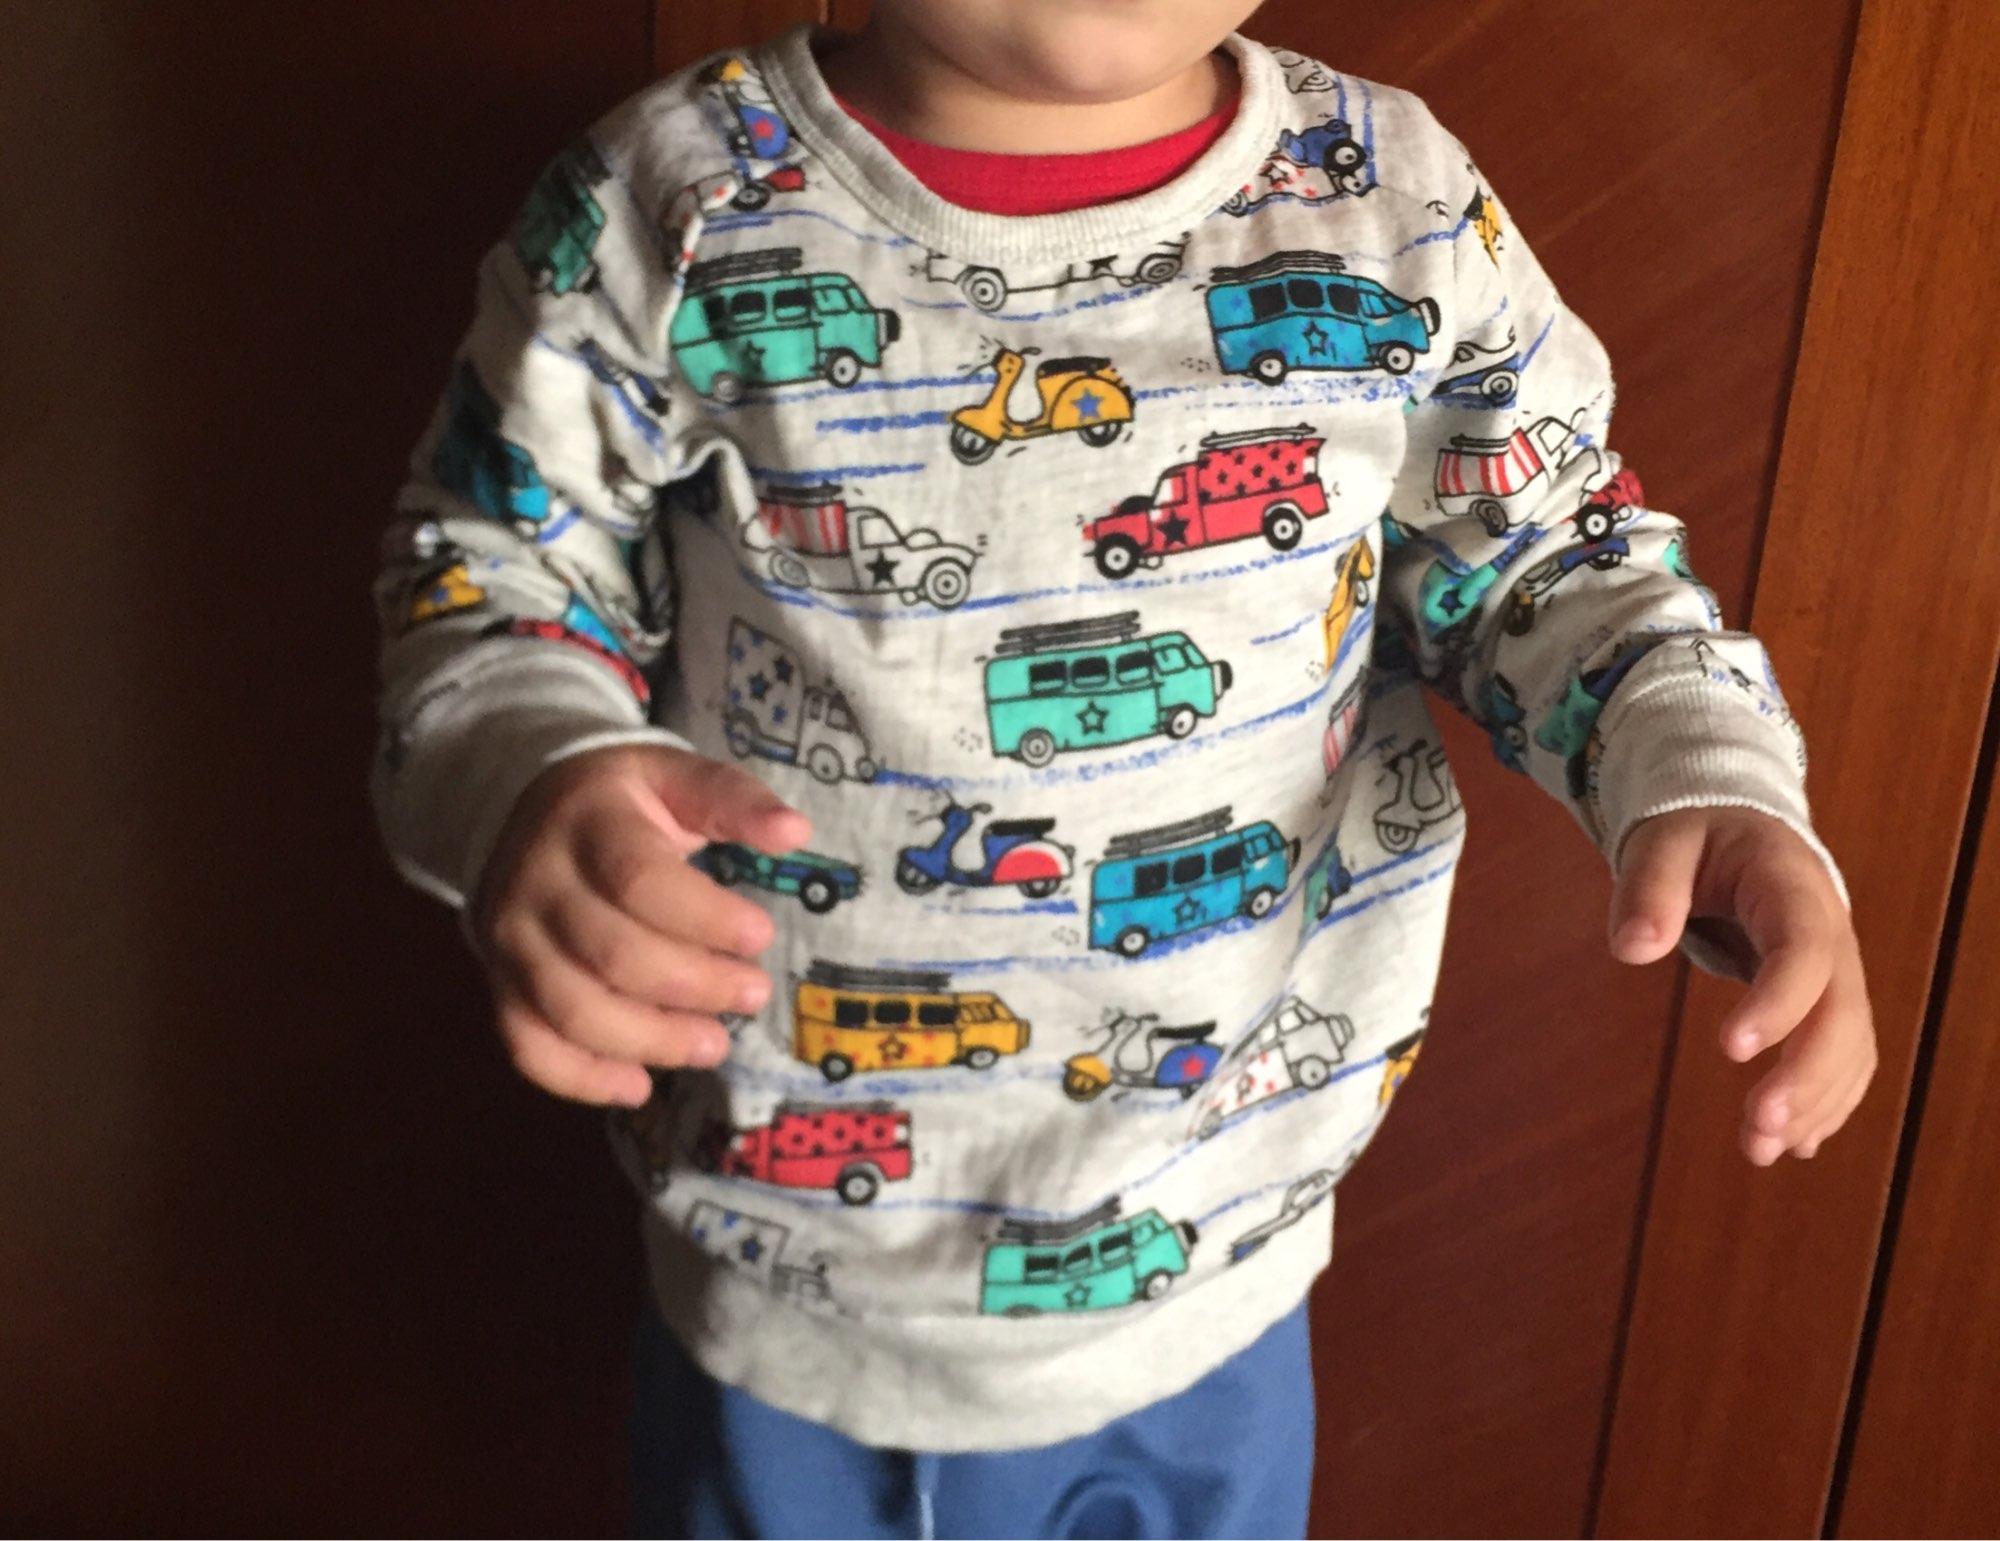 SAILEROAD Cartoon Car Print Boys Sweatshirts for Kids Clothes Autumn Children Hoodies Clothing 2019 Kids Girls Christmas Costume photo review